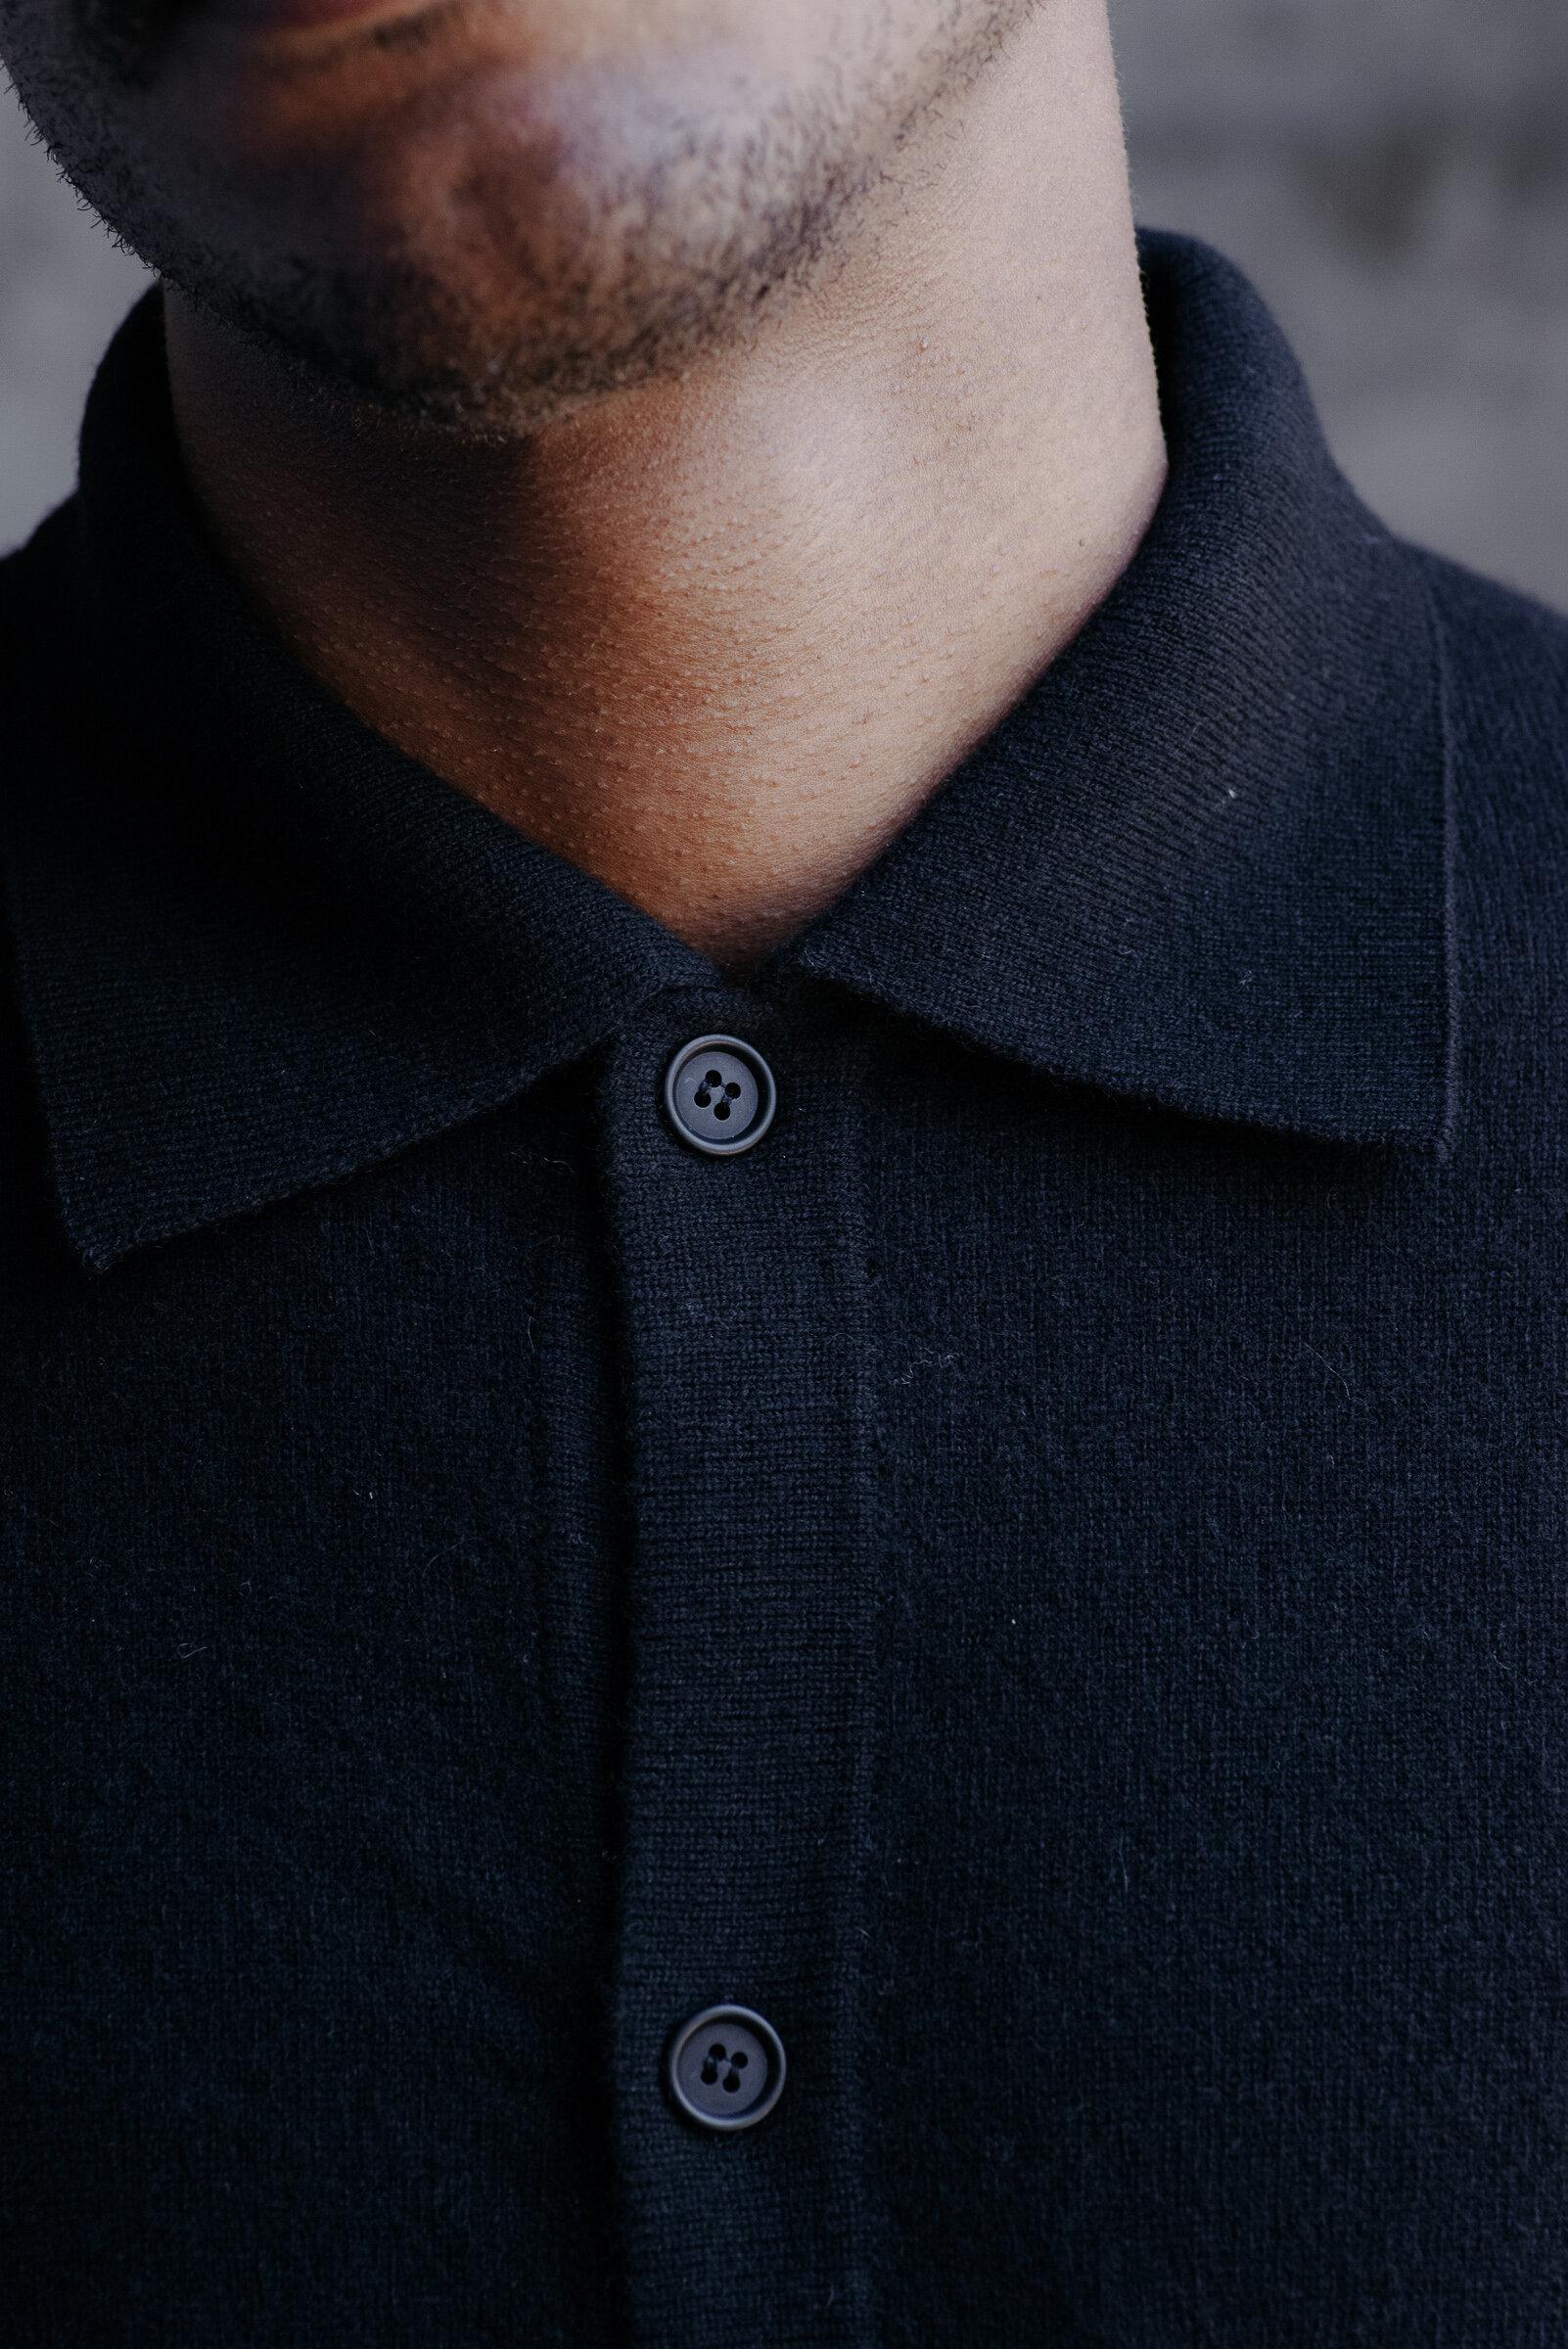 evan-kinori-knit-shirt-cashmere-lambswool-made-in-italy-8